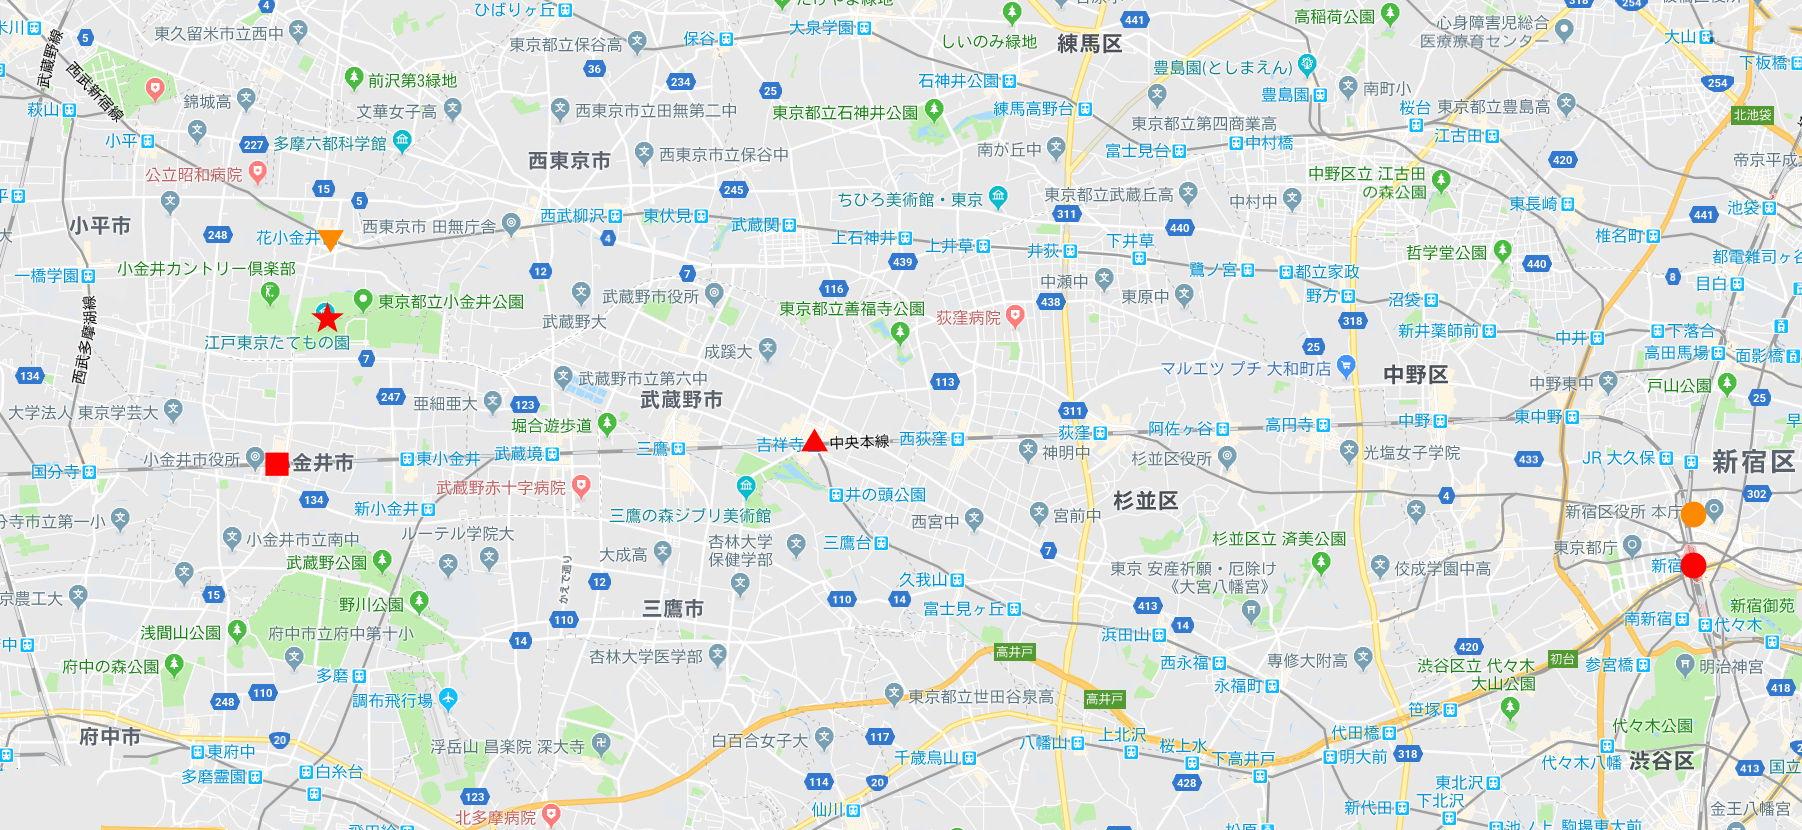 東京・小金井公園・森の中の東京都電7514号2005-7502